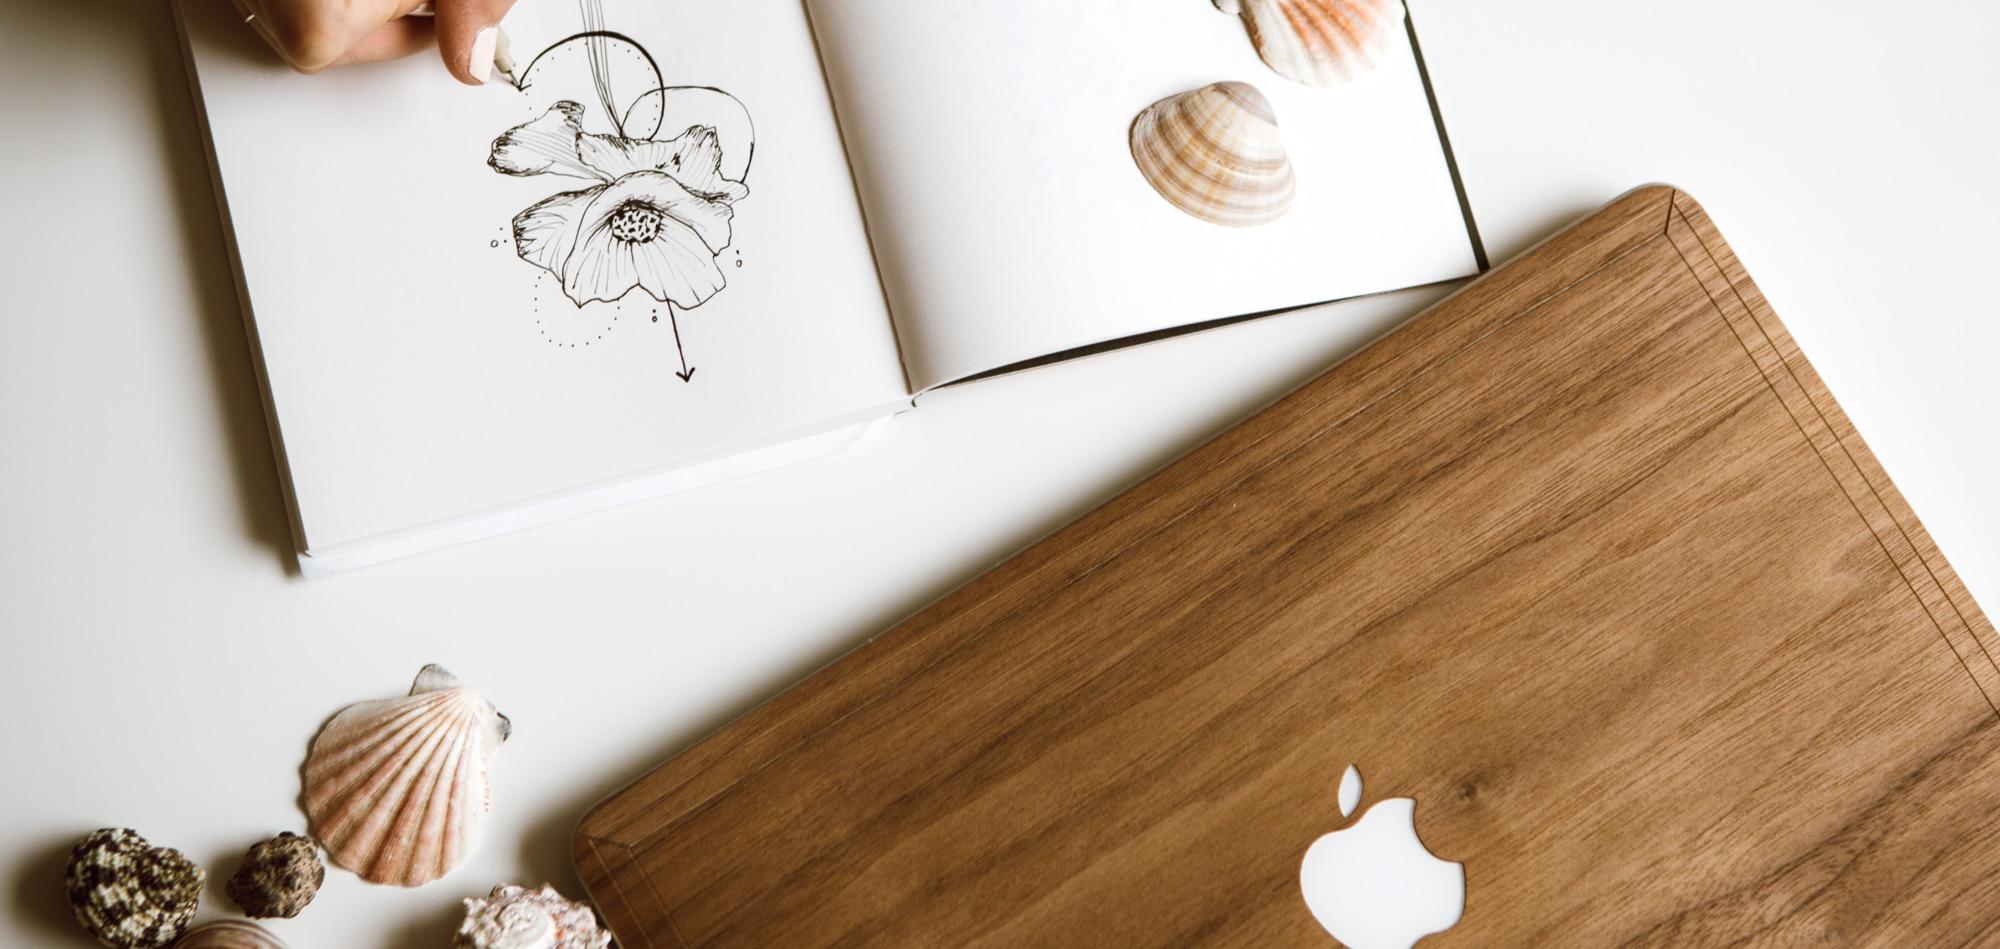 woodcessories-holz-case-iphone-7-plus-se-ecocase-holzhuelle-handyhuelle-huelle-apple-echtholzfolie2